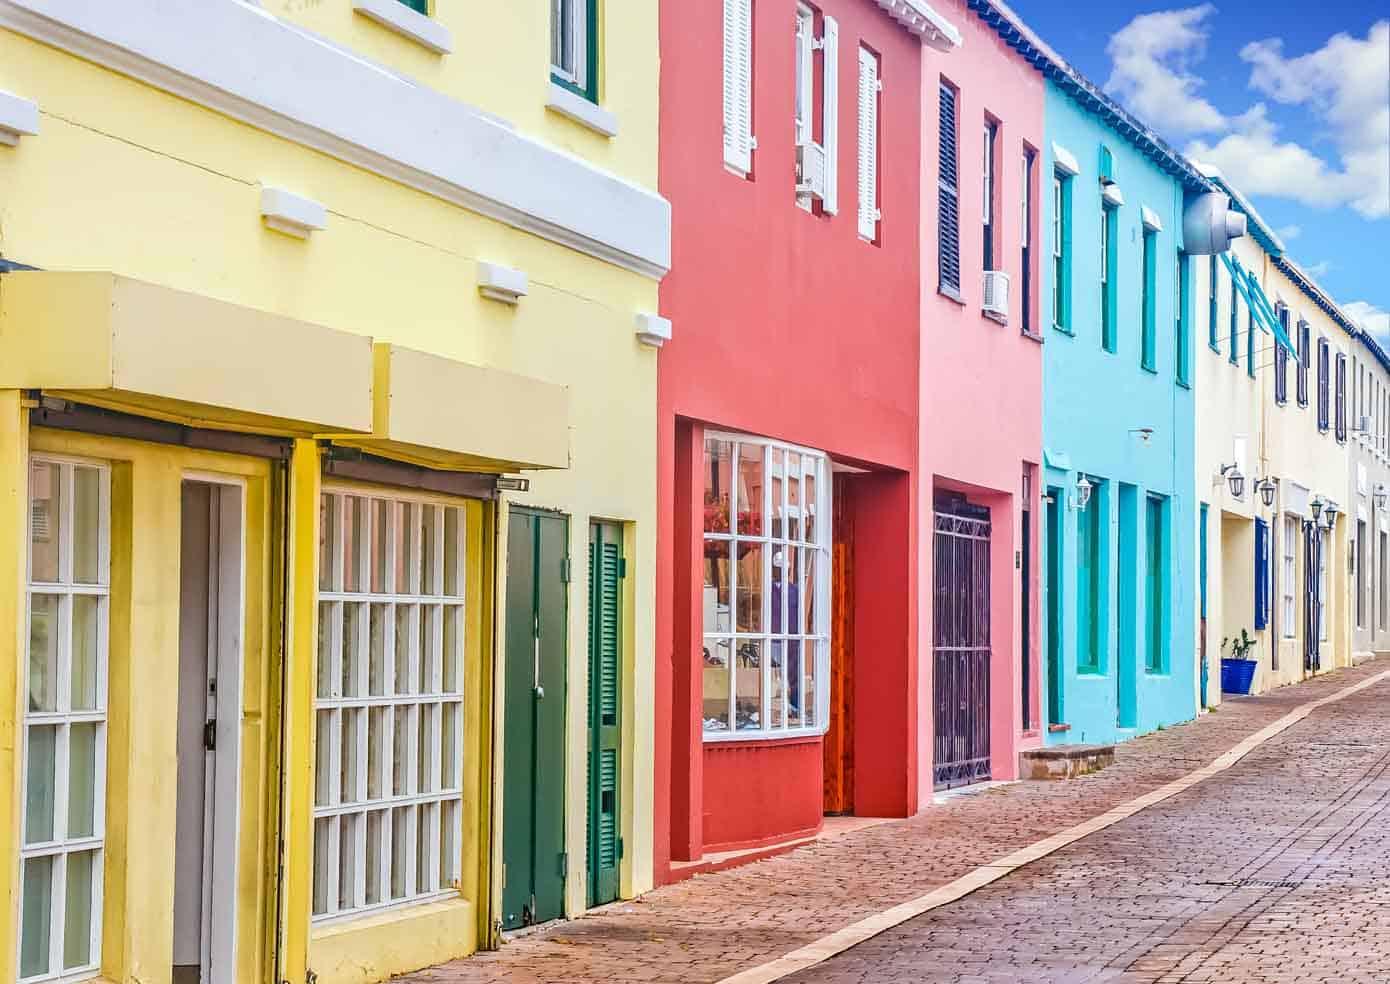 Colorful buildings lining a street in Bermuda.